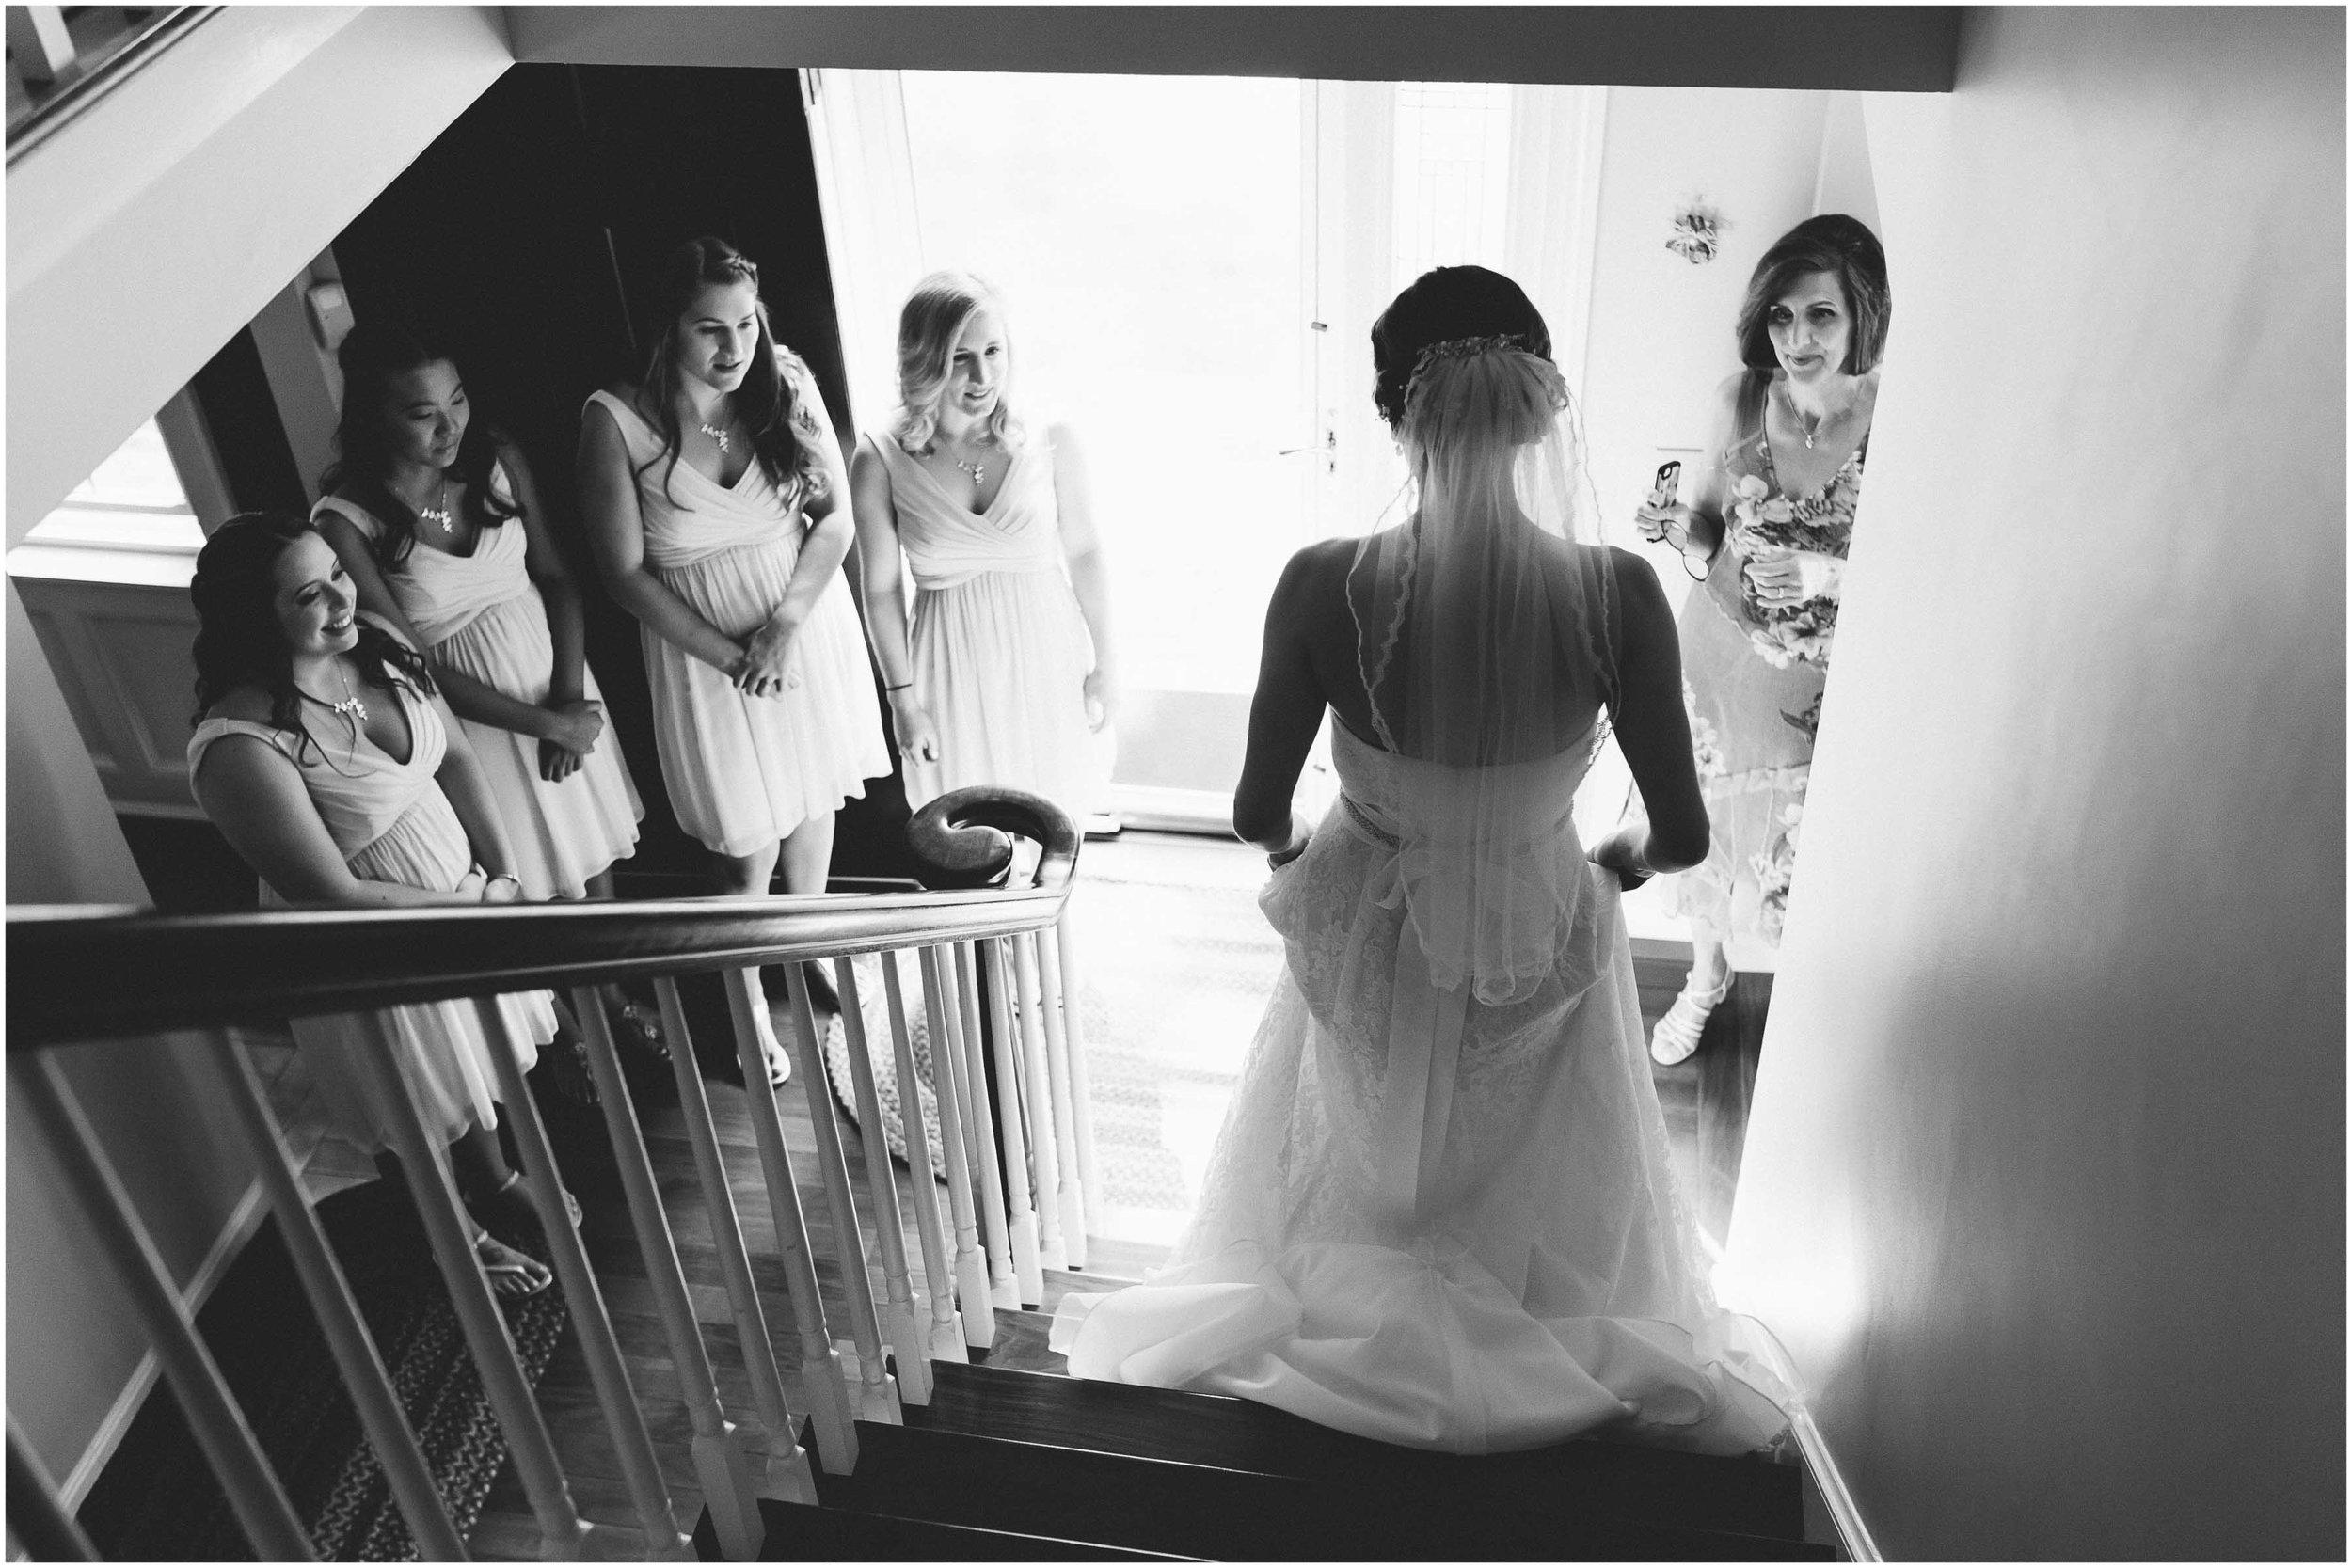 Sunny New Hampshire Summer Wedding at Mile Away Restaurant - bridesmaids surprised